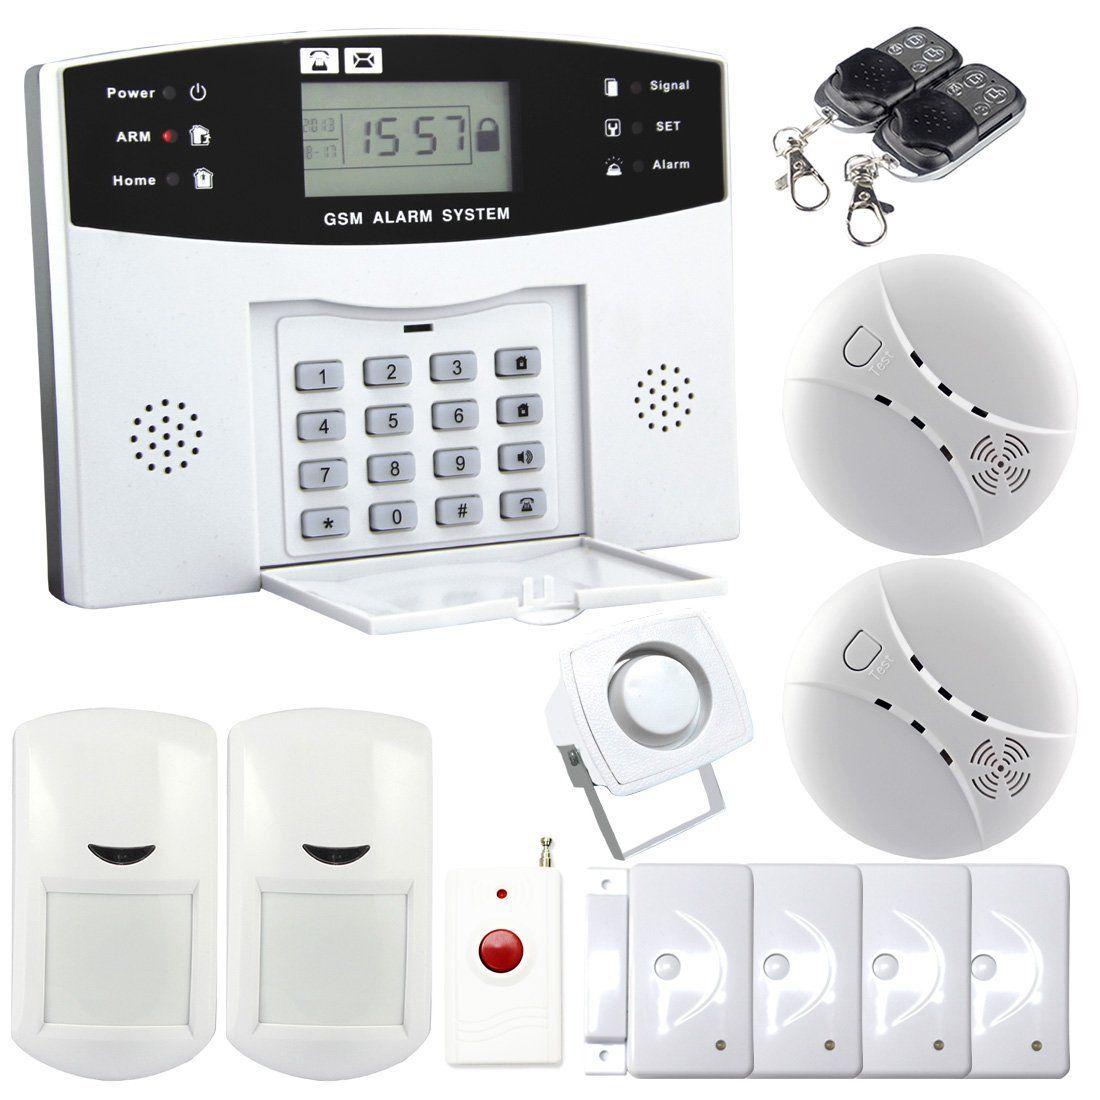 Safearmed® 고전적인 가정 안전 SMS 경보 가정 안전 GSM 경보망 무선 똑똑한 장비, 지적인 안전 경보망